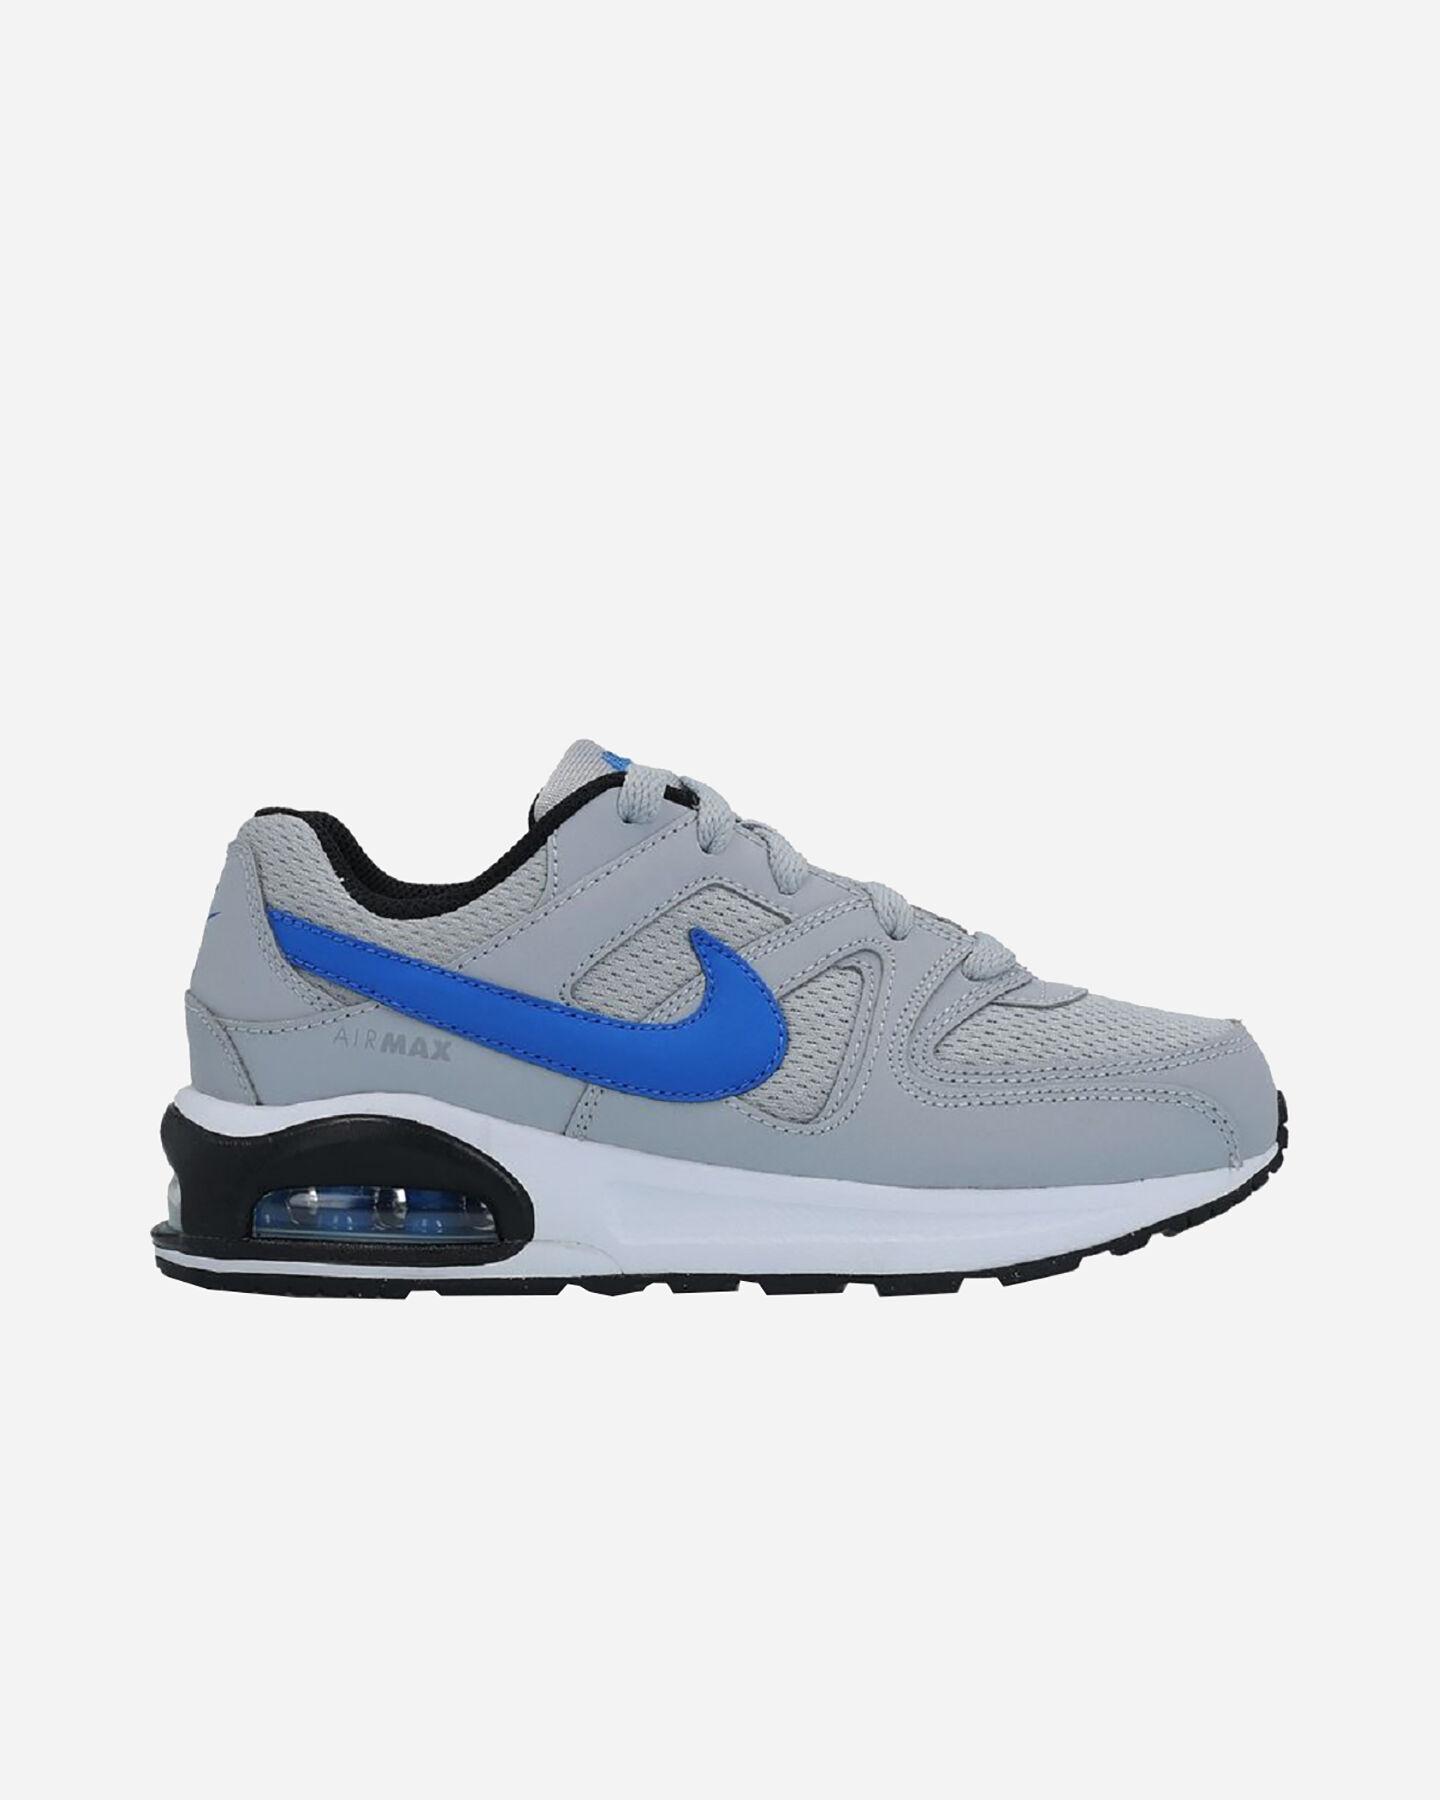 scarpe bimba 23 converse